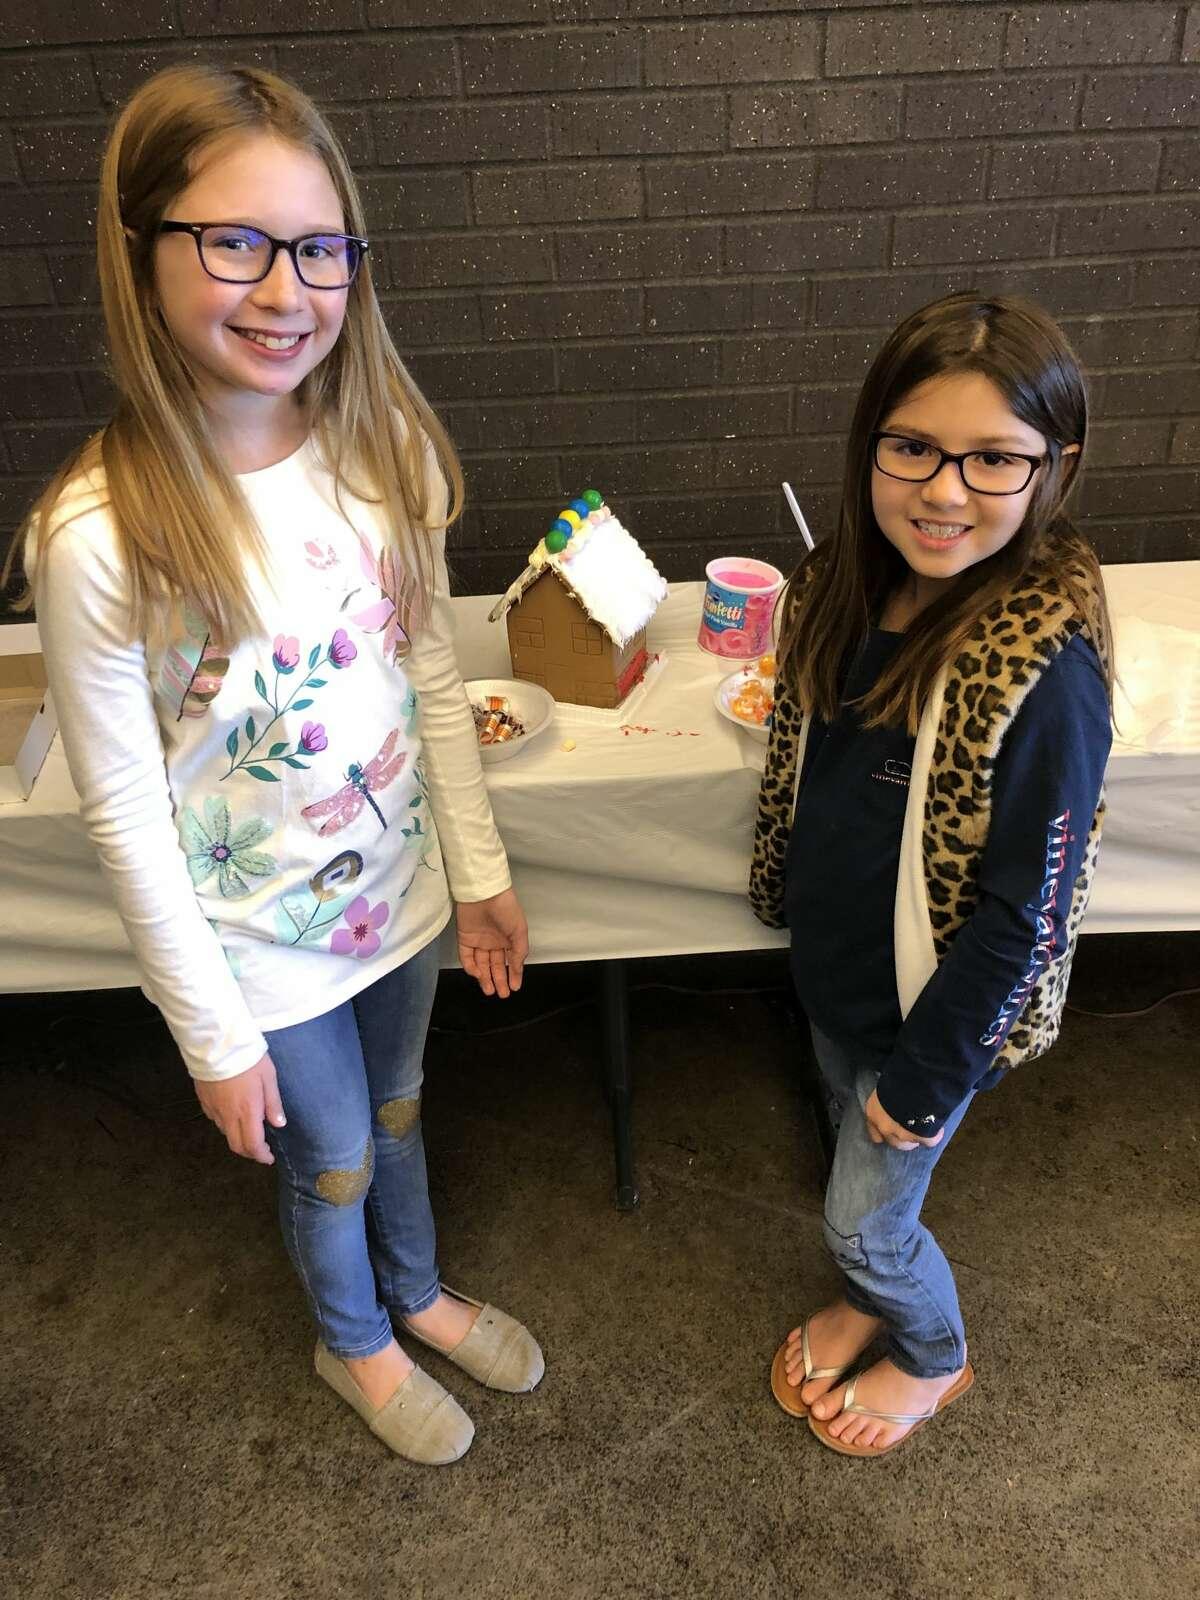 Gingerbread houses: Iva Garza, left, and Cora Garza